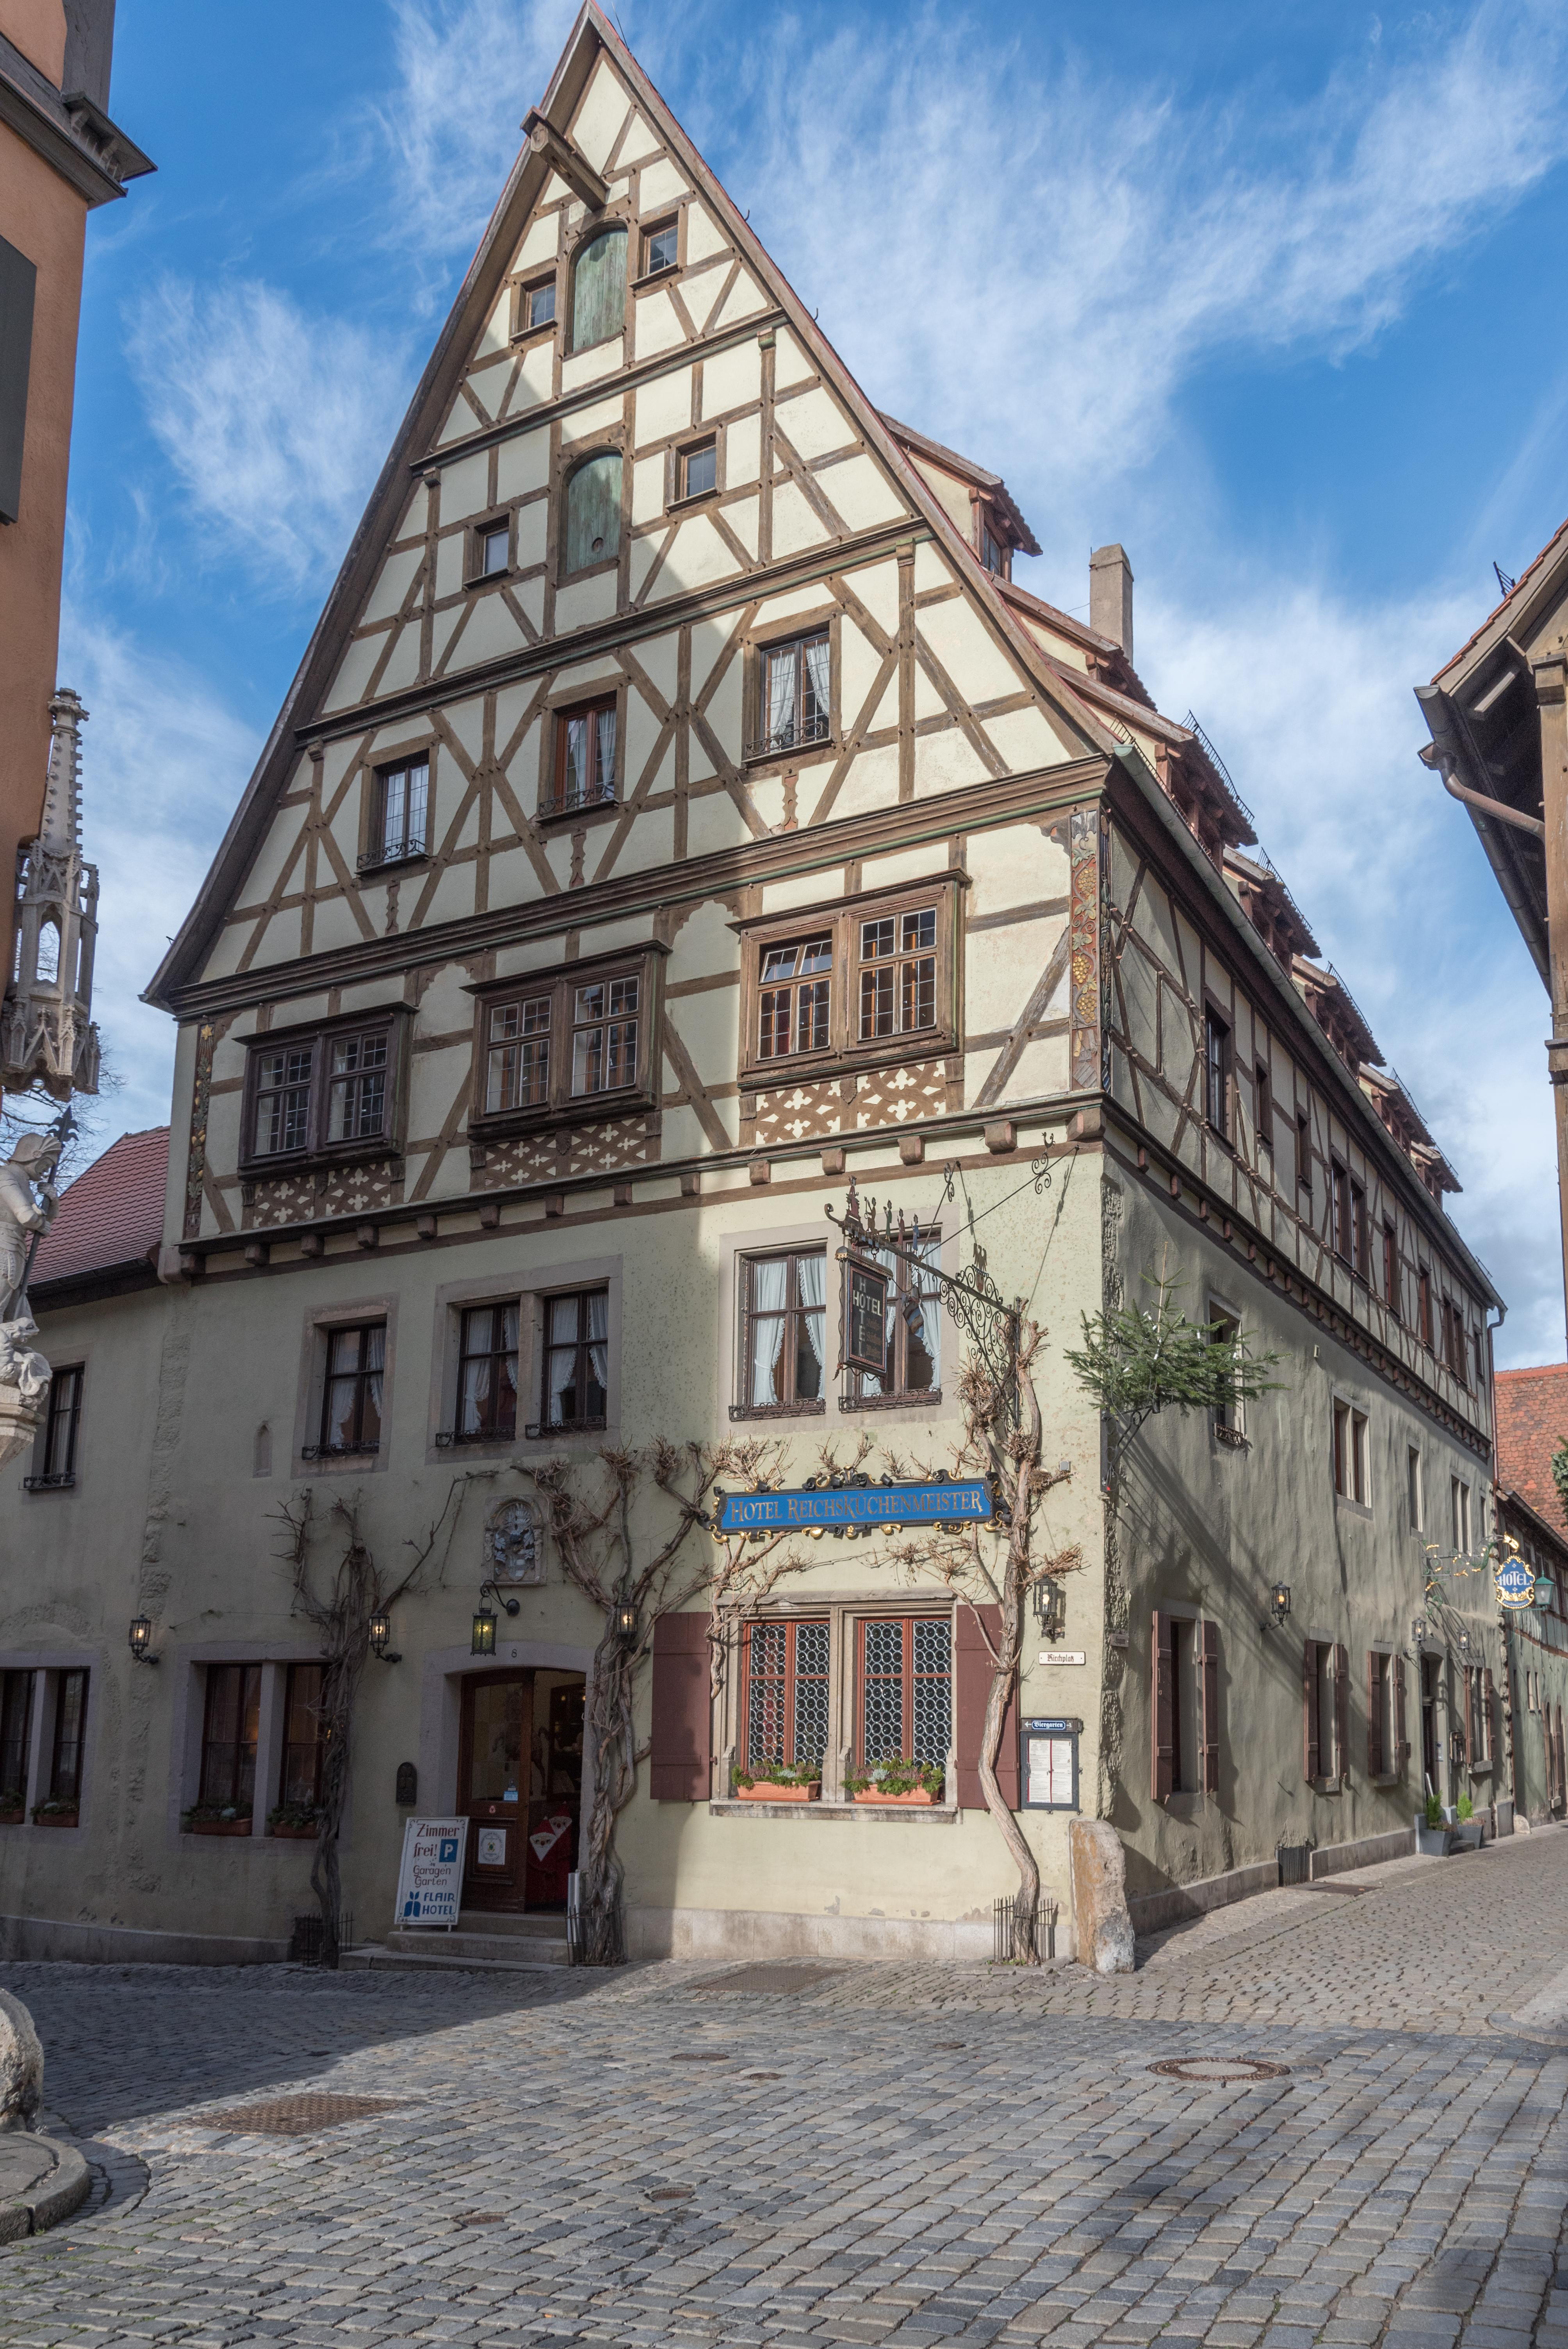 File Rothenburg Ob Der Tauber Kirchplatz 8 20160108 004 Jpg Wikimedia Commons